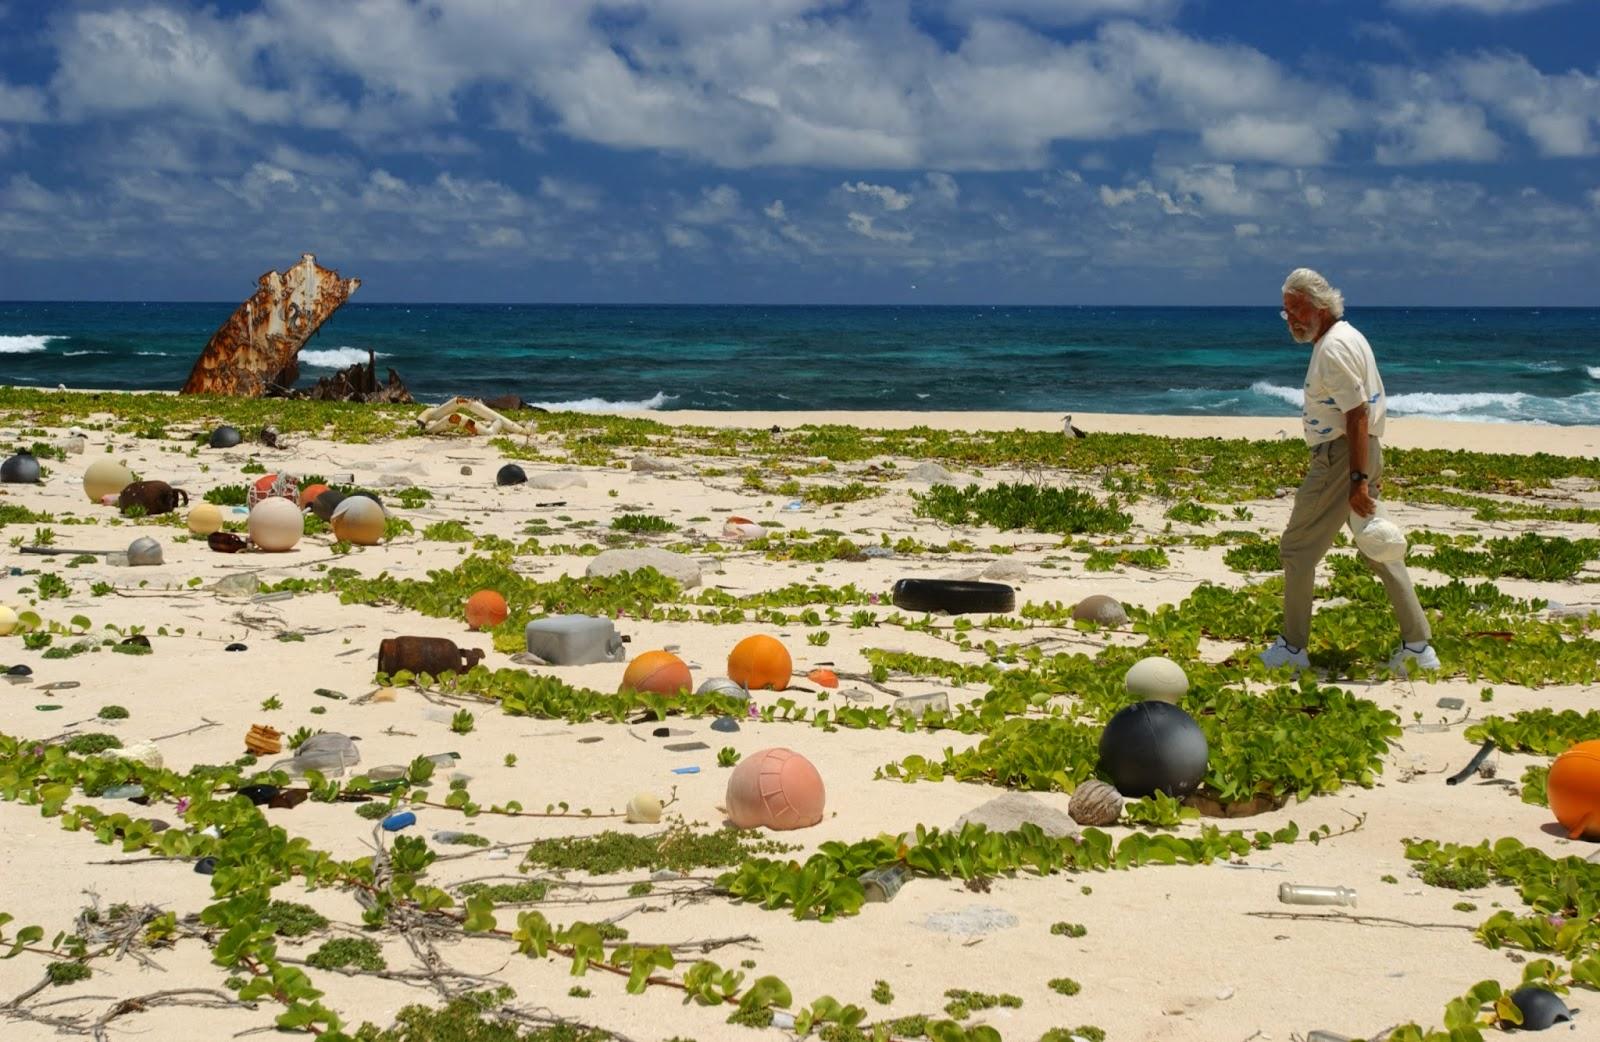 Kure Atoll - Travel Guide - Exotic Travel Destination